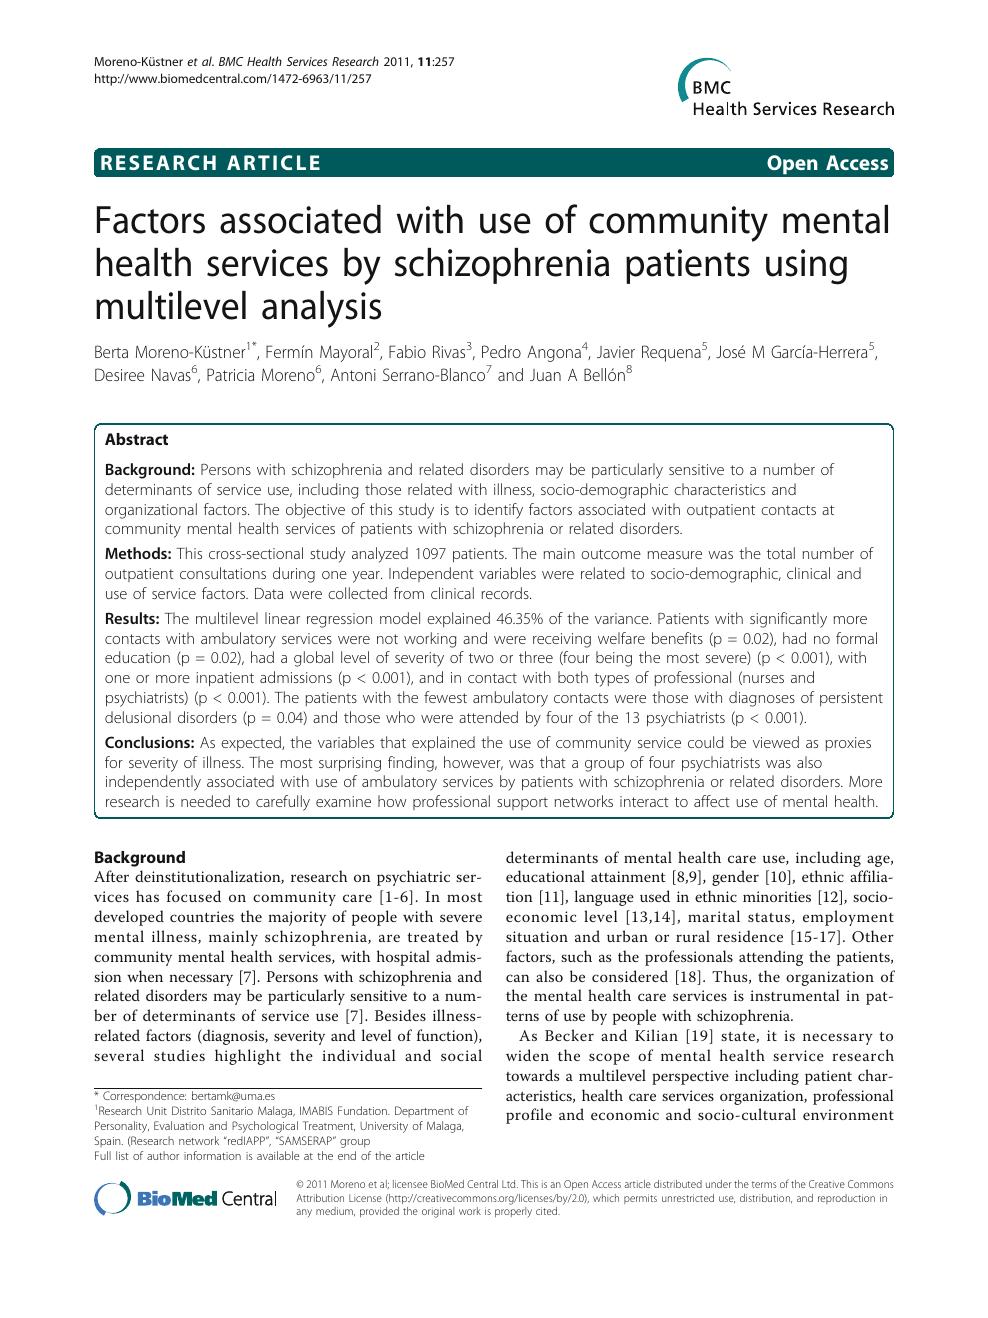 Sanitari Scala Ideal Standard factors associated with use of community mental health